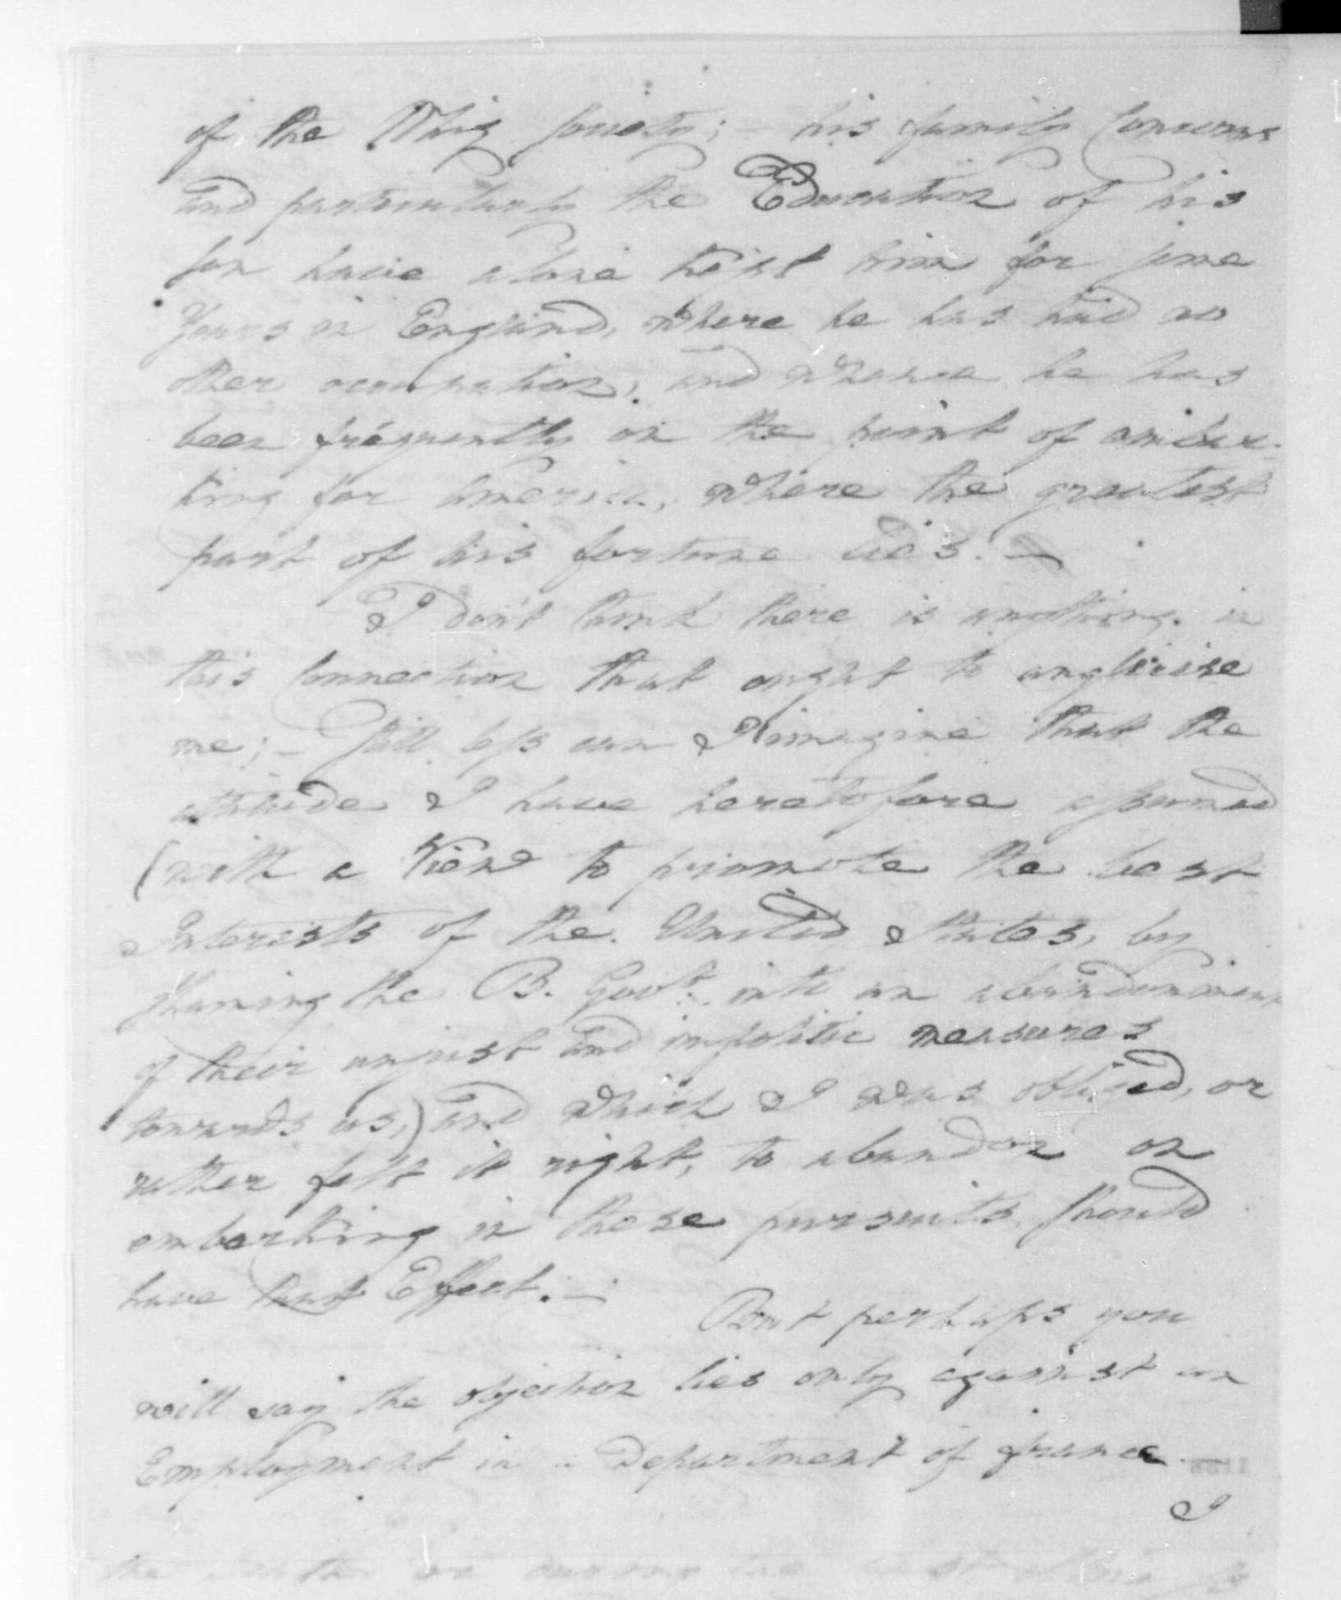 George Joy to James Madison, June 9, 1811.